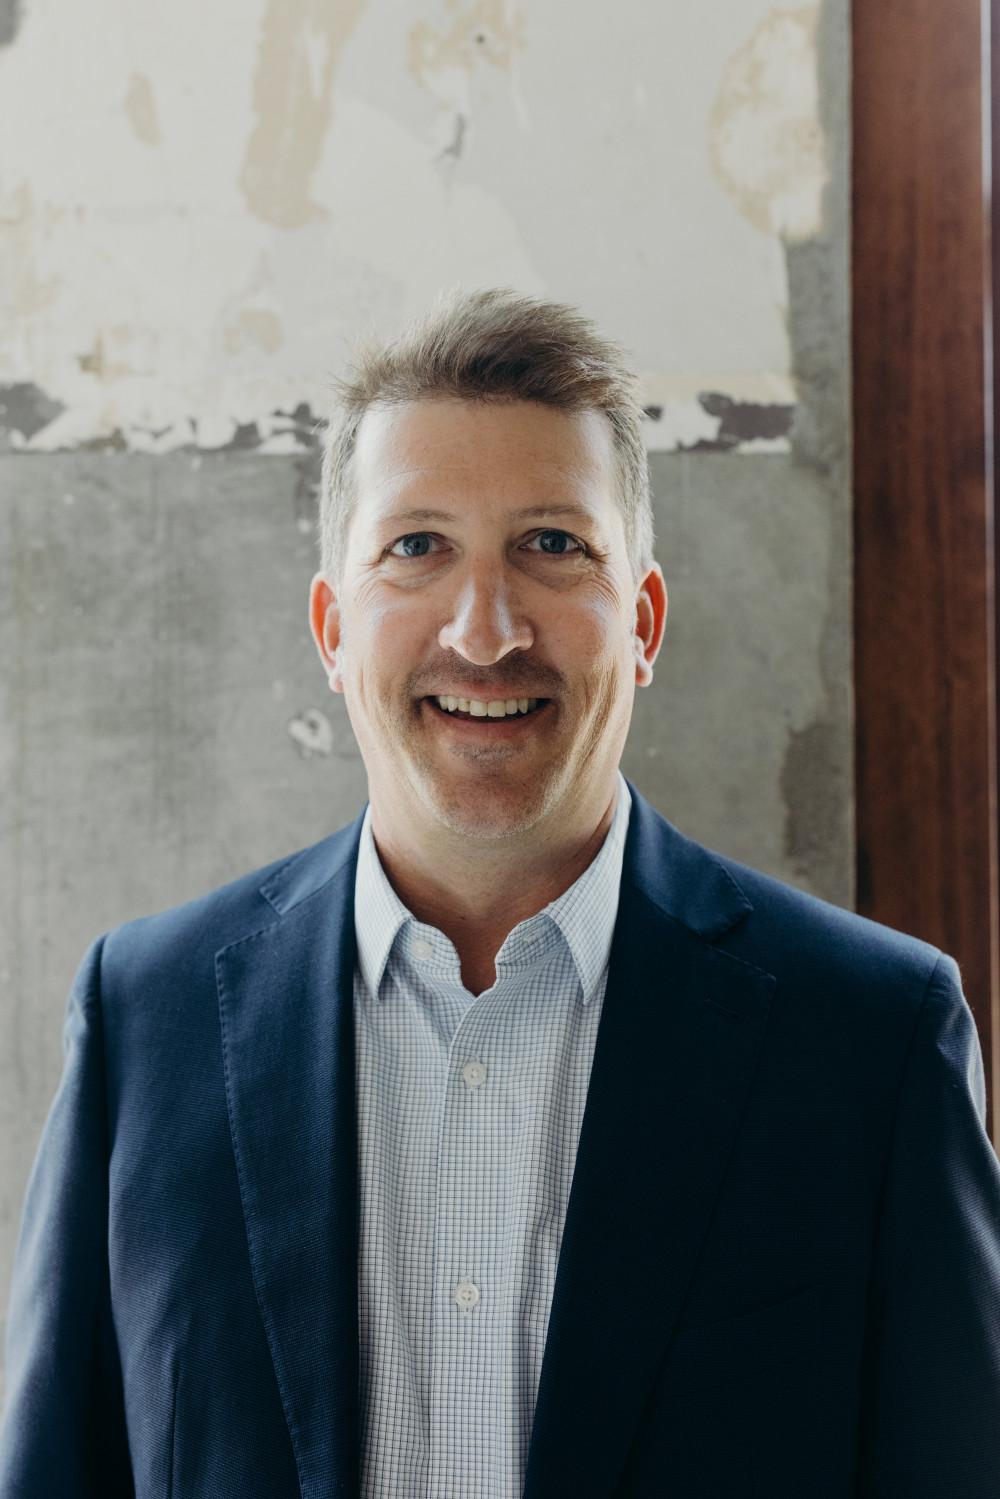 Craig Bishopp, Financial Advisor